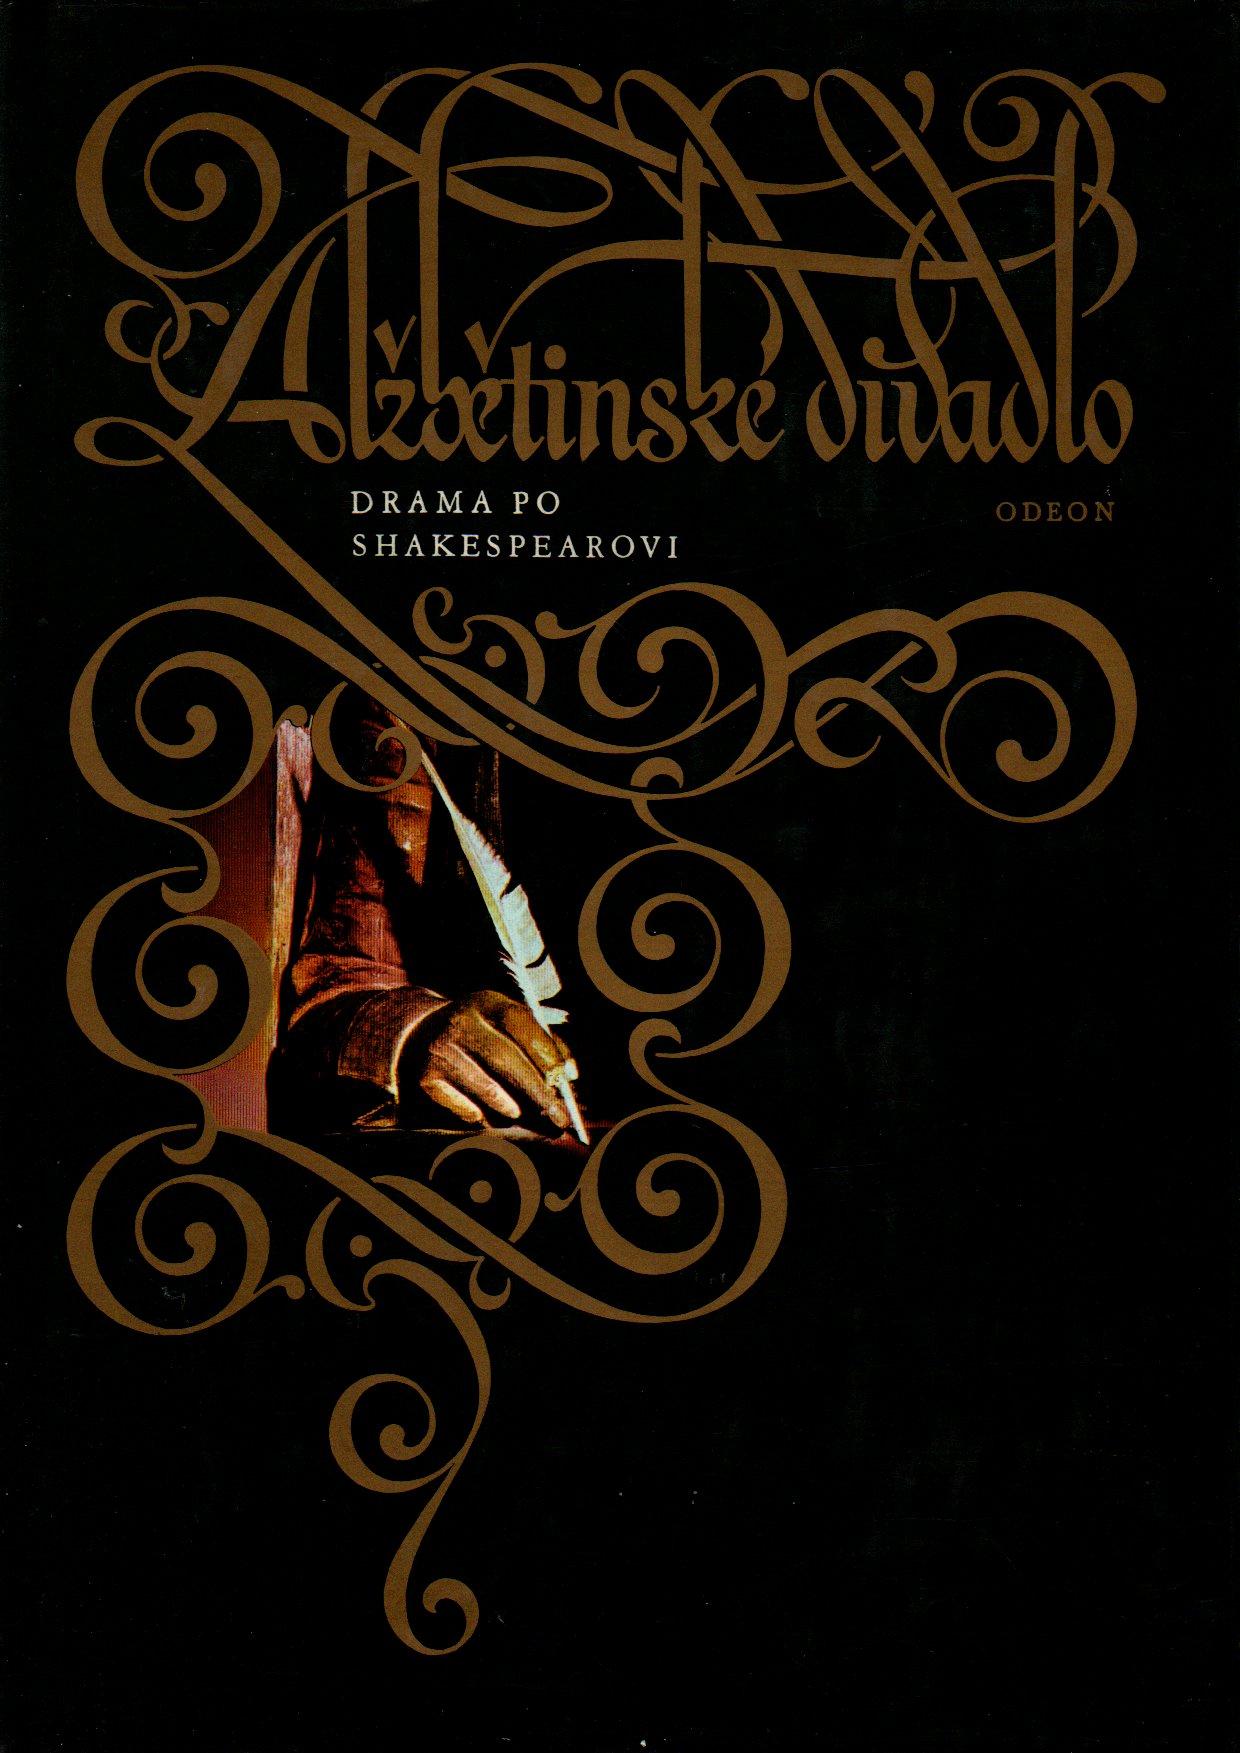 Alžbětinské divadlo - Drama po Shakespearovi